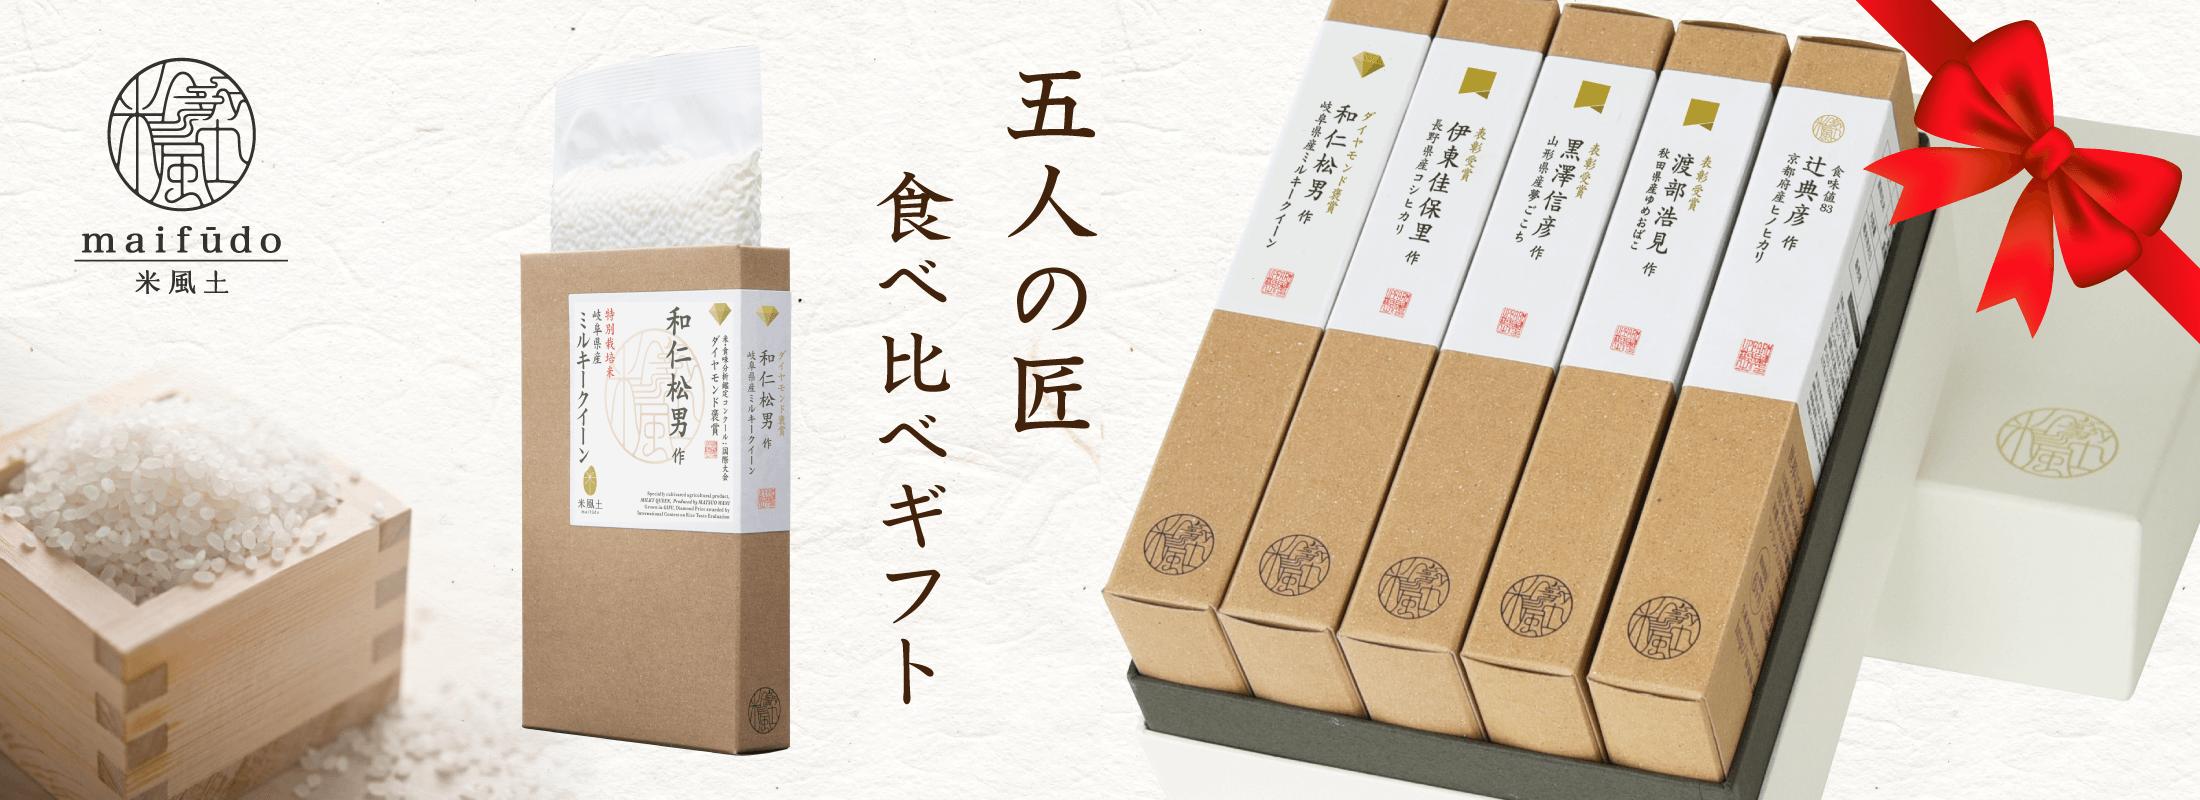 米風土GIFT BOX5